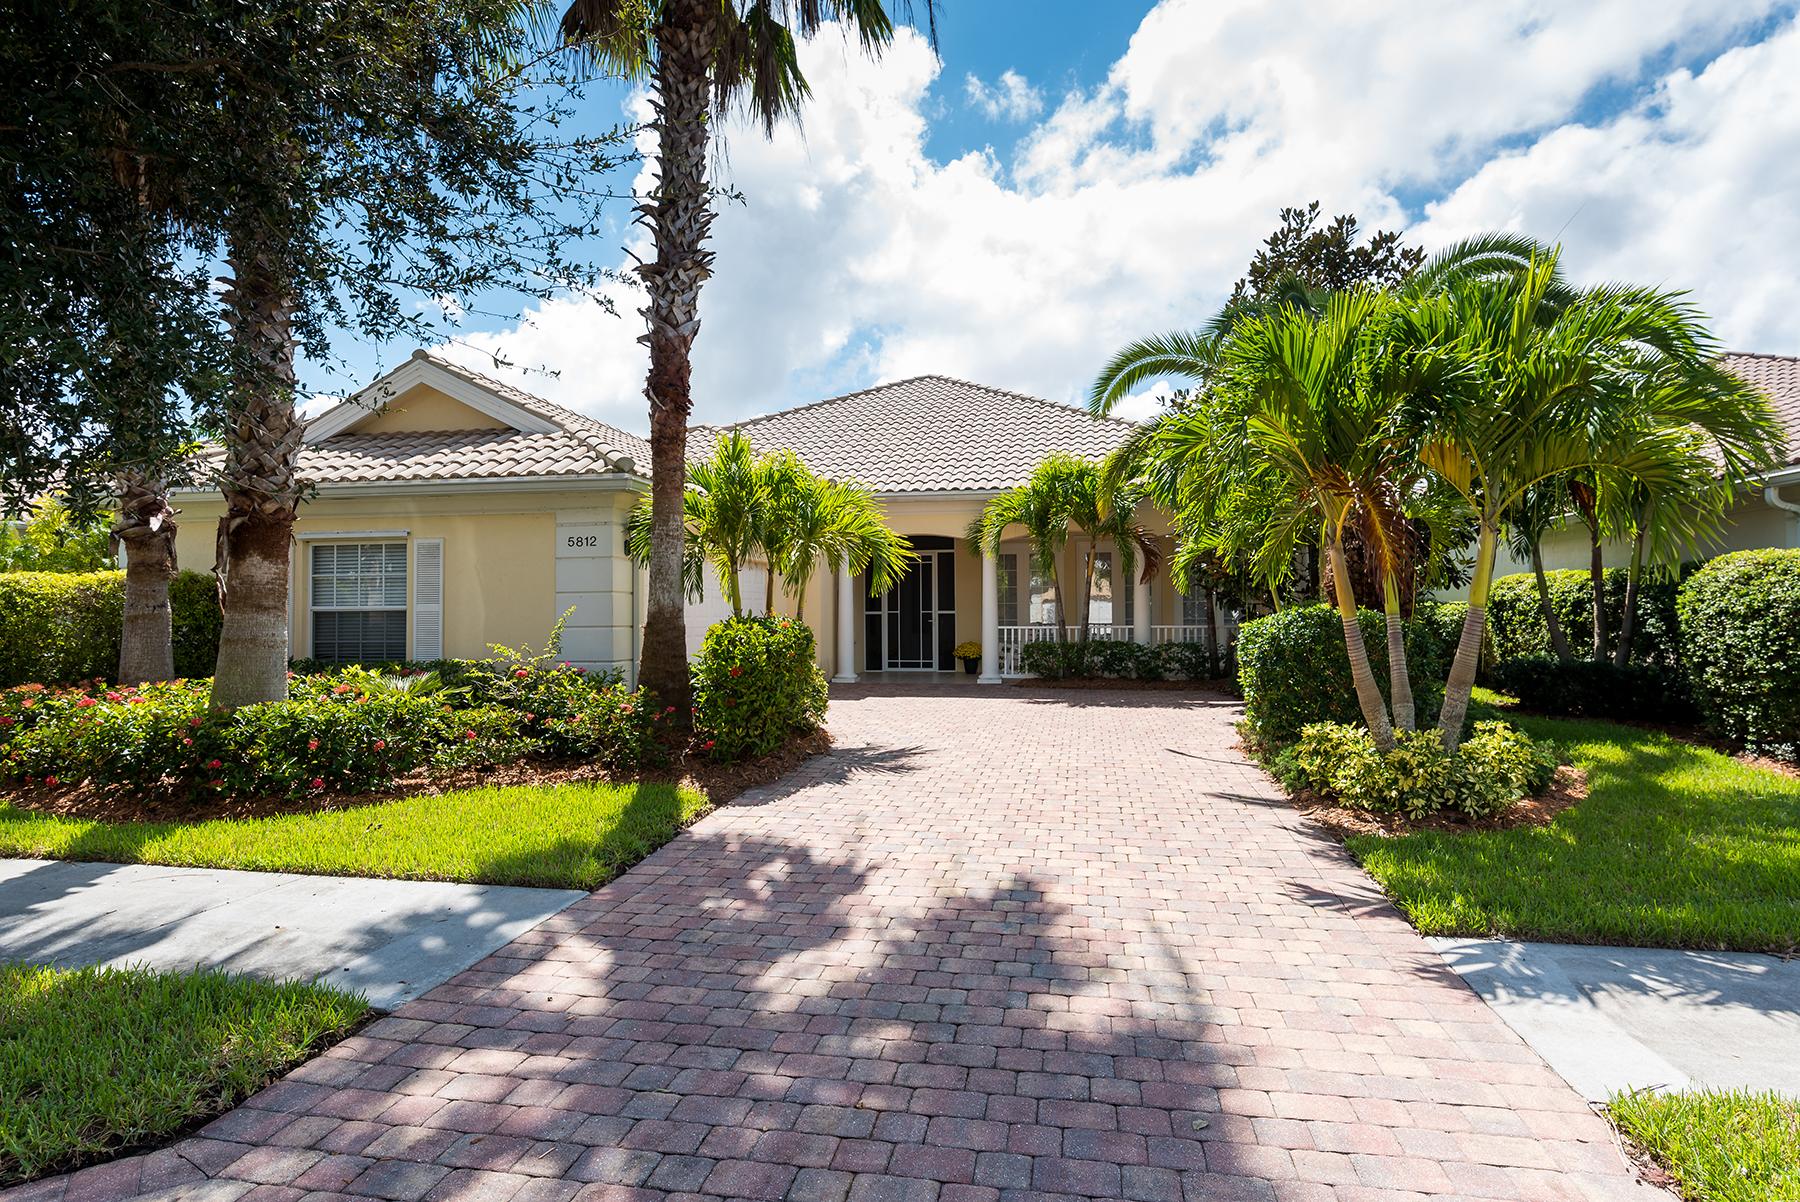 Single Family Home for Sale at VILLAGE WALK 5812 Valente Pl Sarasota, Florida, 34238 United States